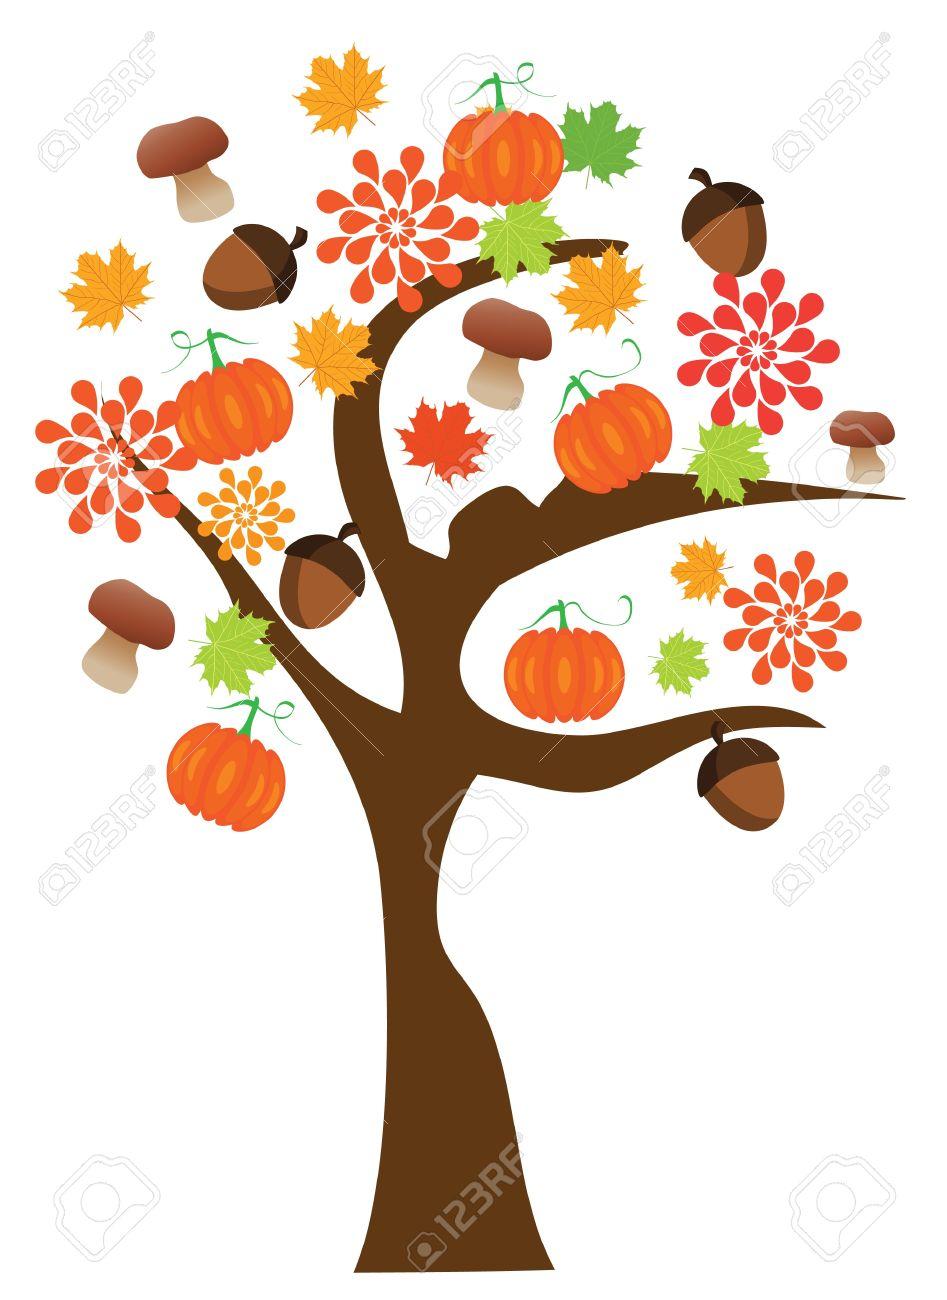 Vector Fall Tree Royalty Free Cliparts, Vectors, And Stock.